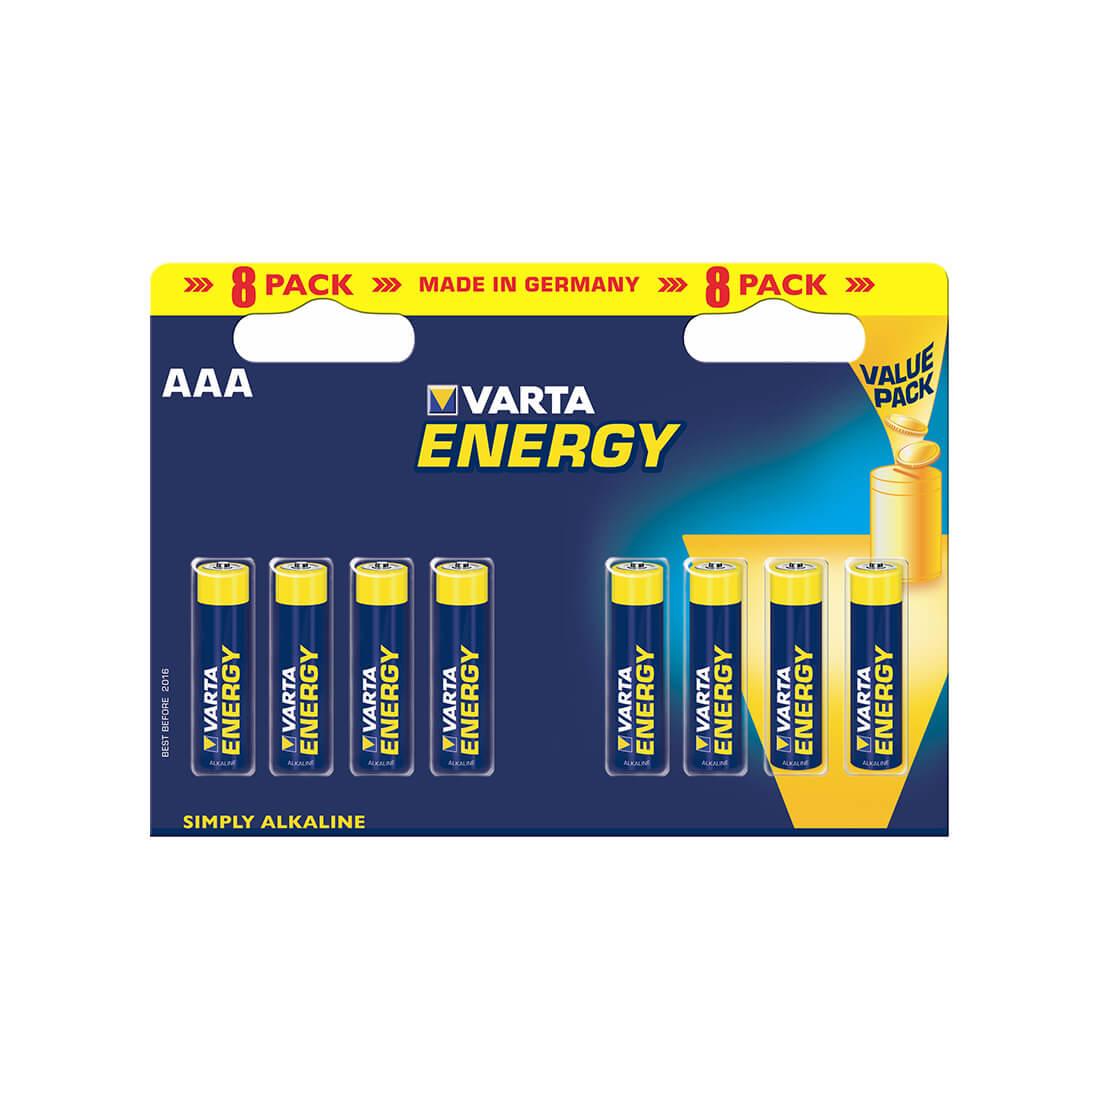 Baterky Varta Energy AAA alkalické 8 kusov